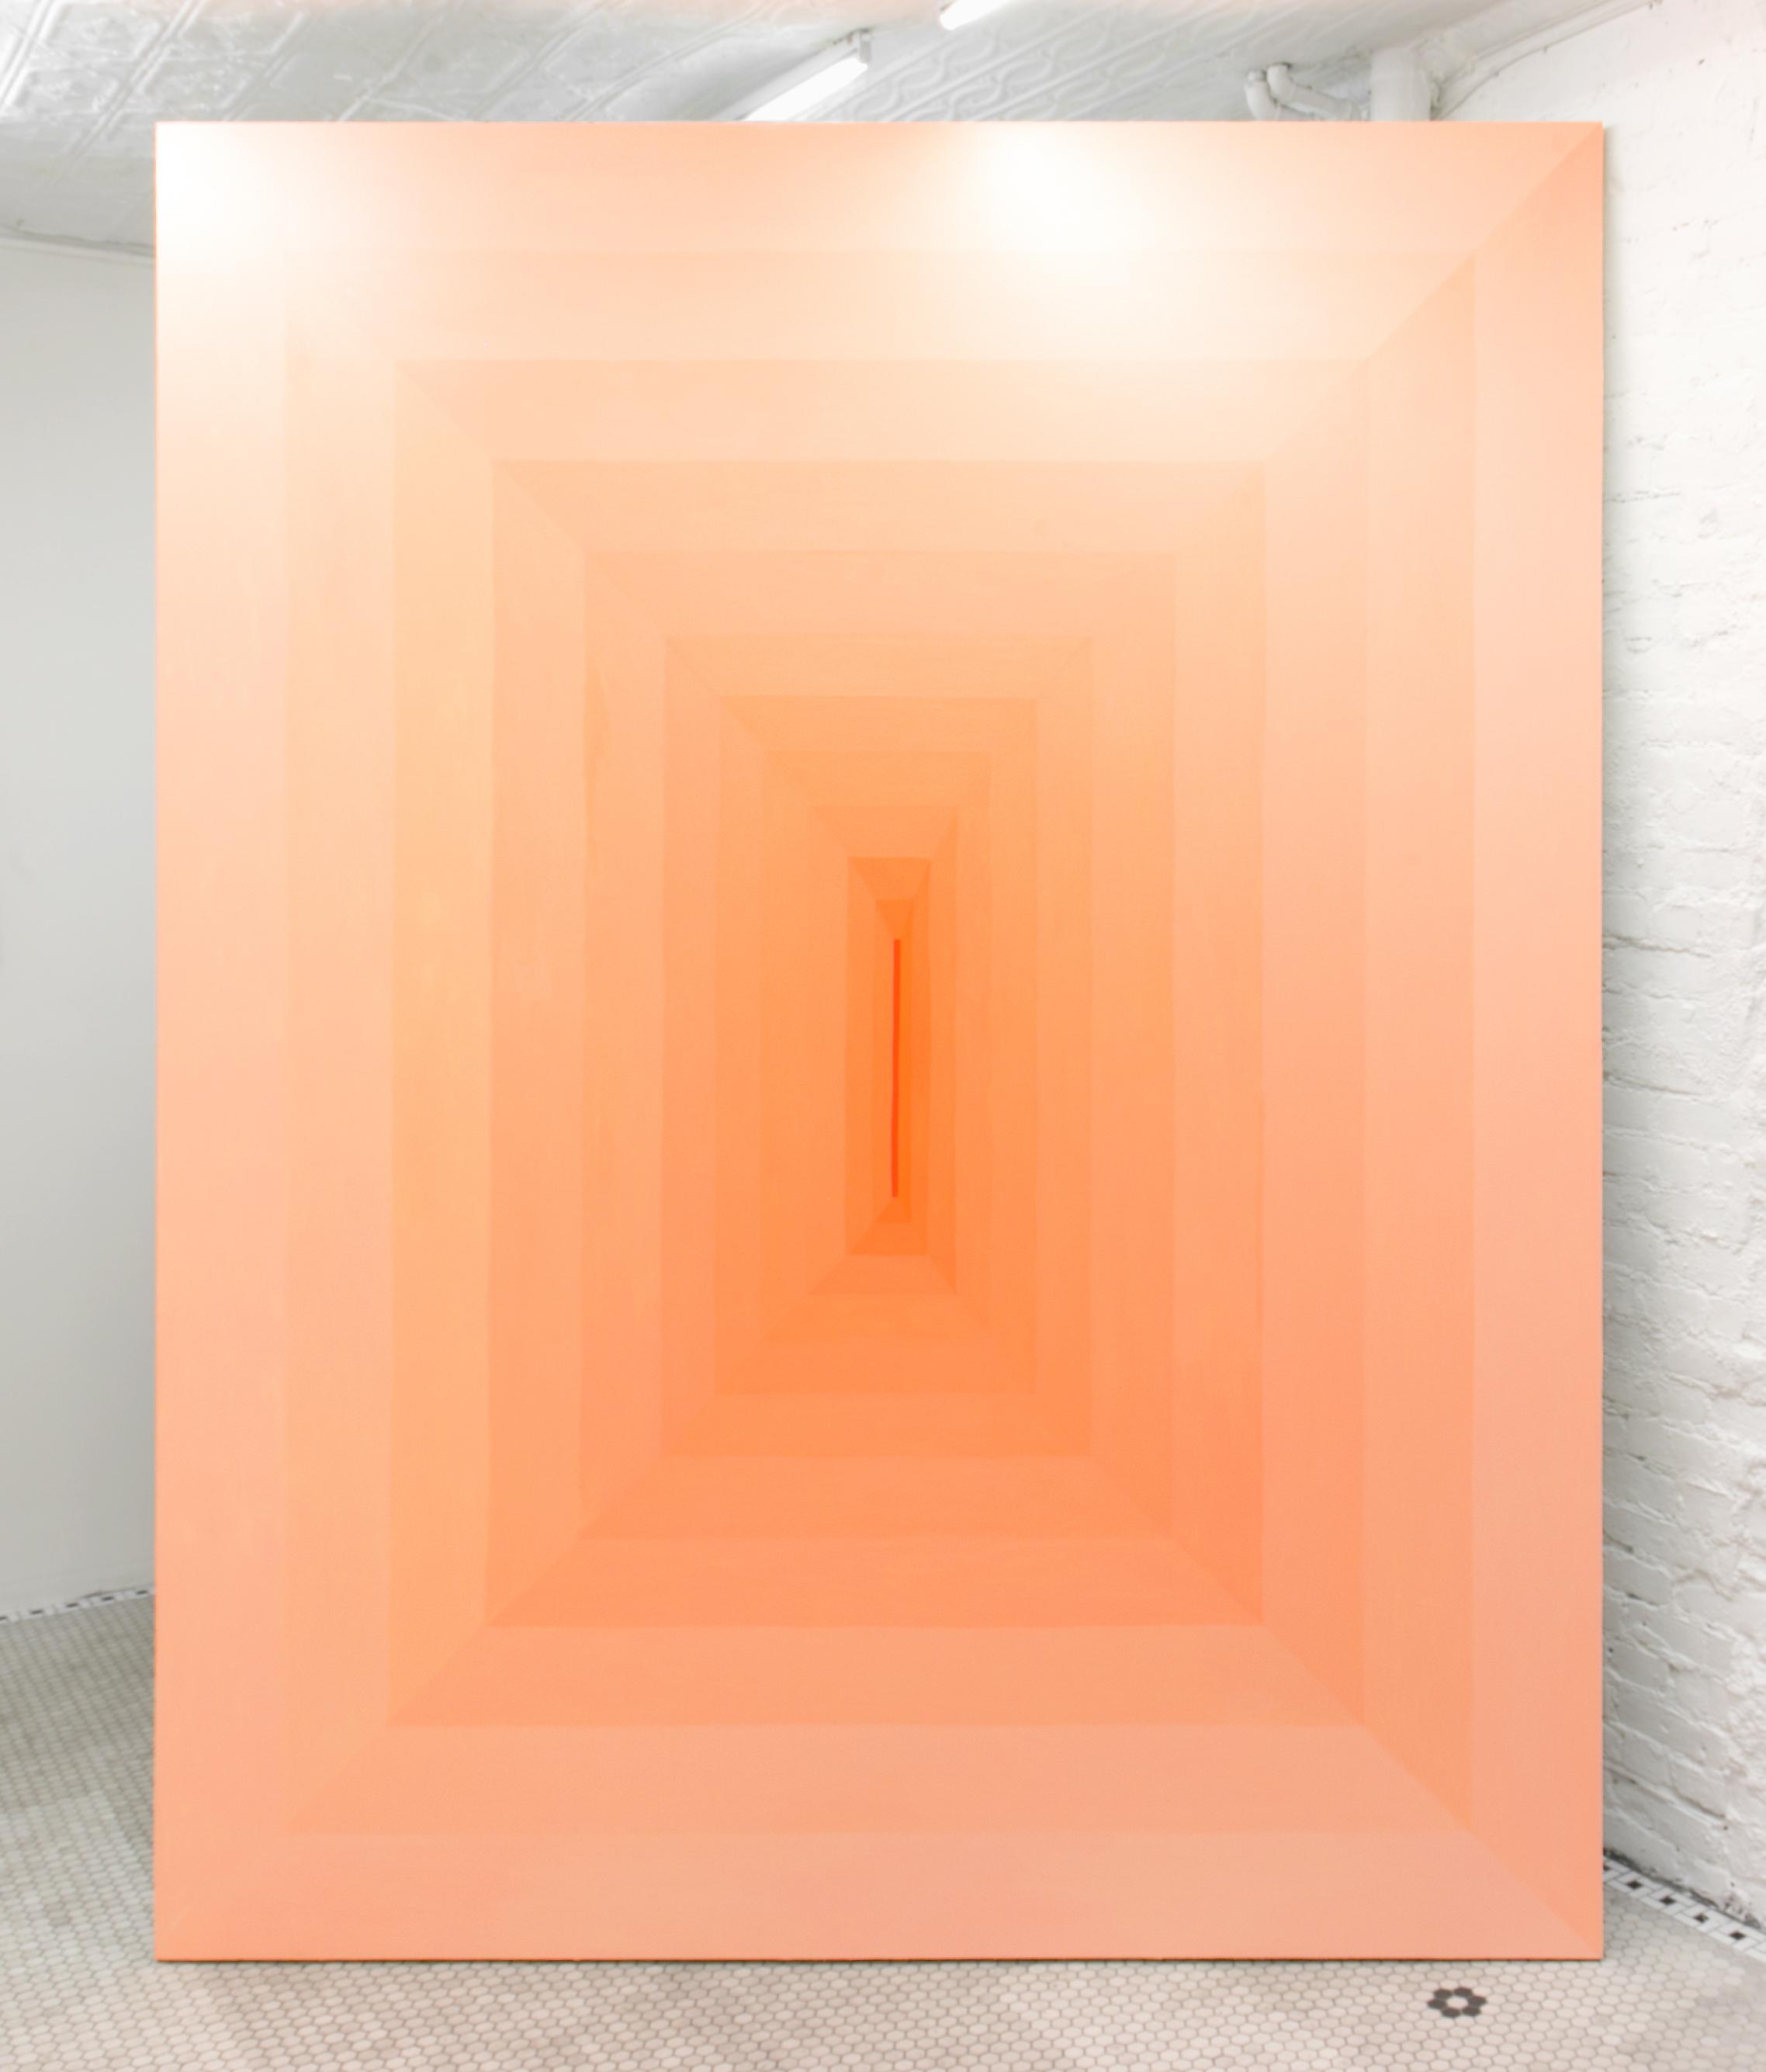 Installation view of Dwell at 17 Essex in NYC, 2016. Photo credit: Kirsten Kilponen. Courtesy 17 Essex, New York